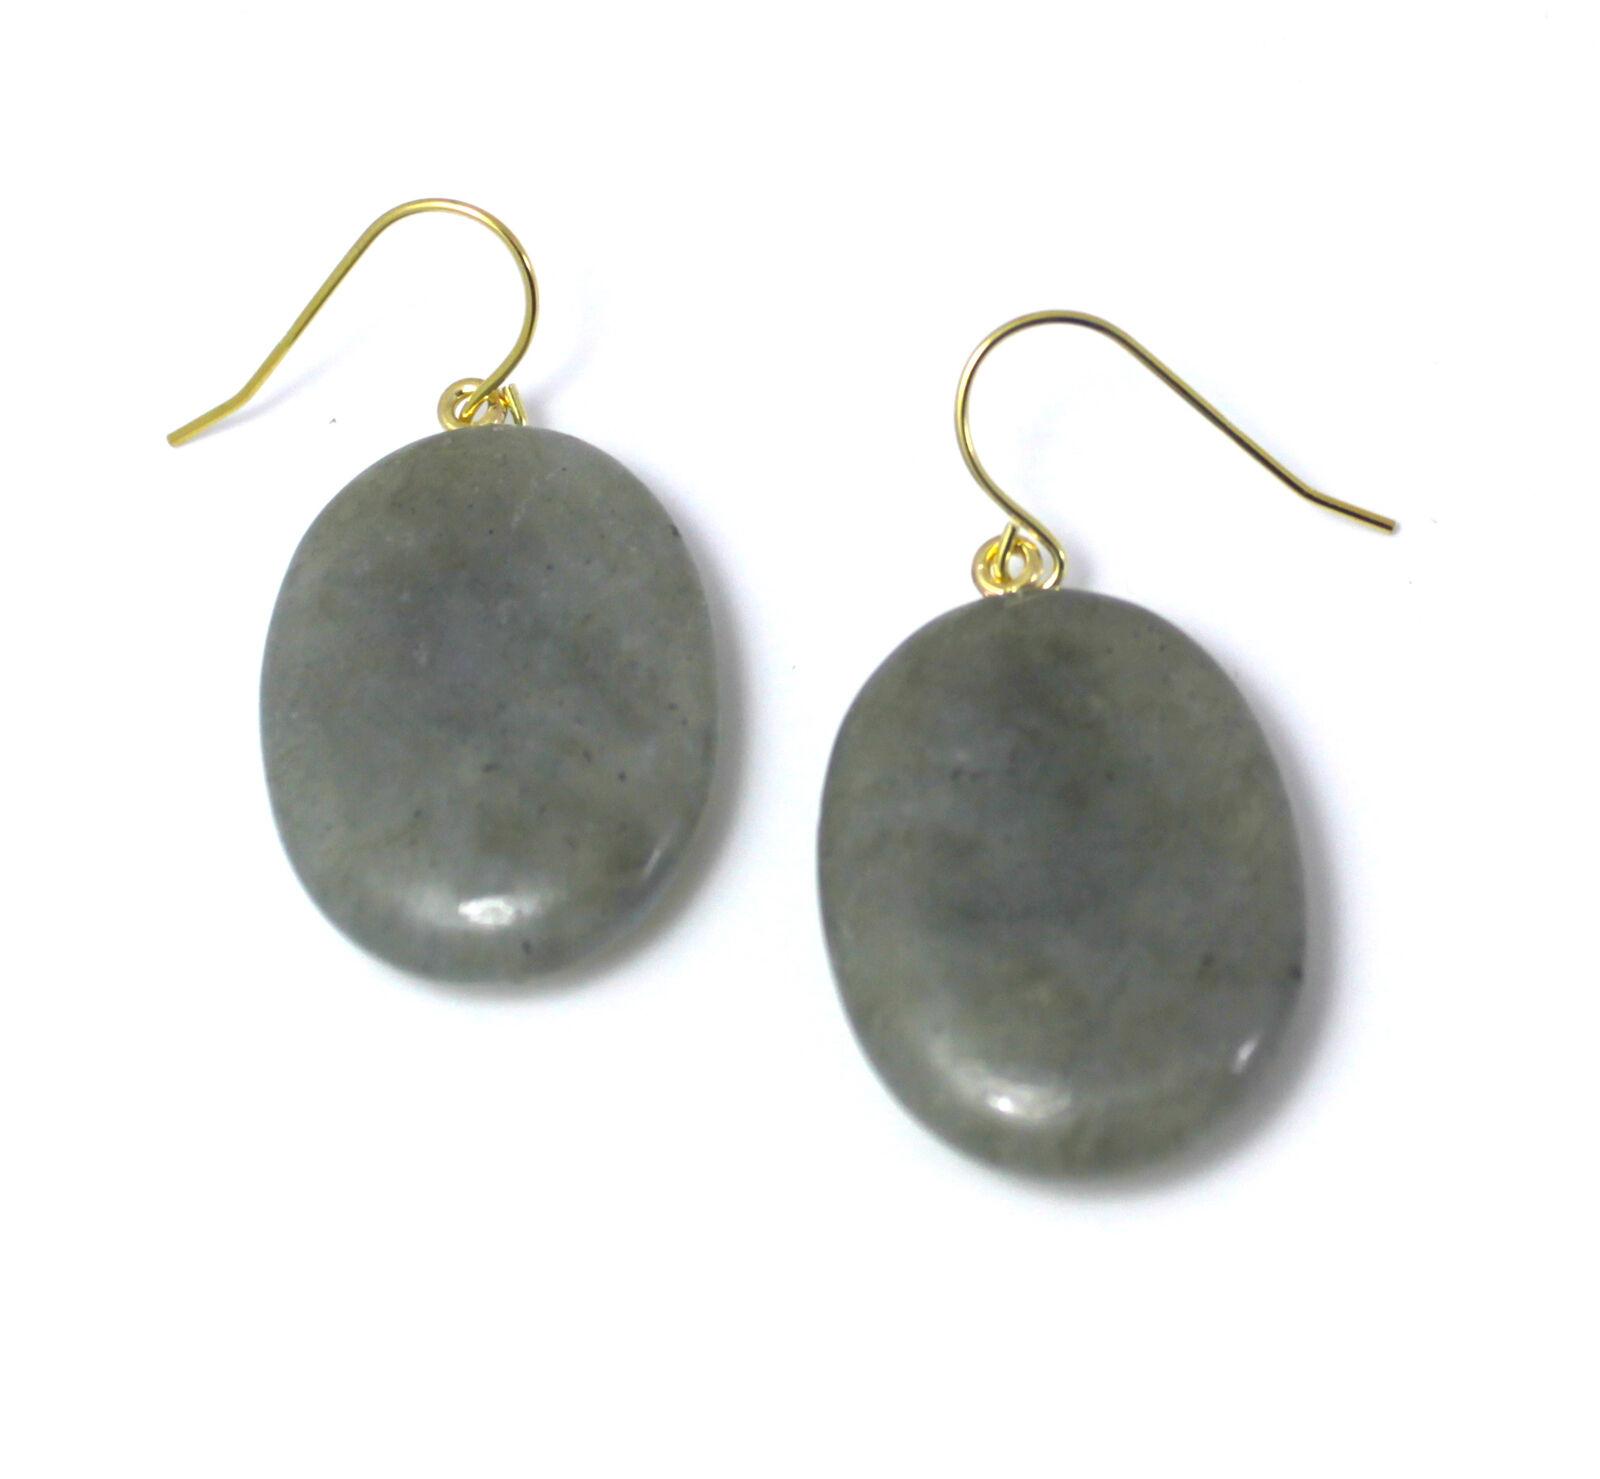 Lola pink Shoshannah gold Tone Earrings in Labradorite